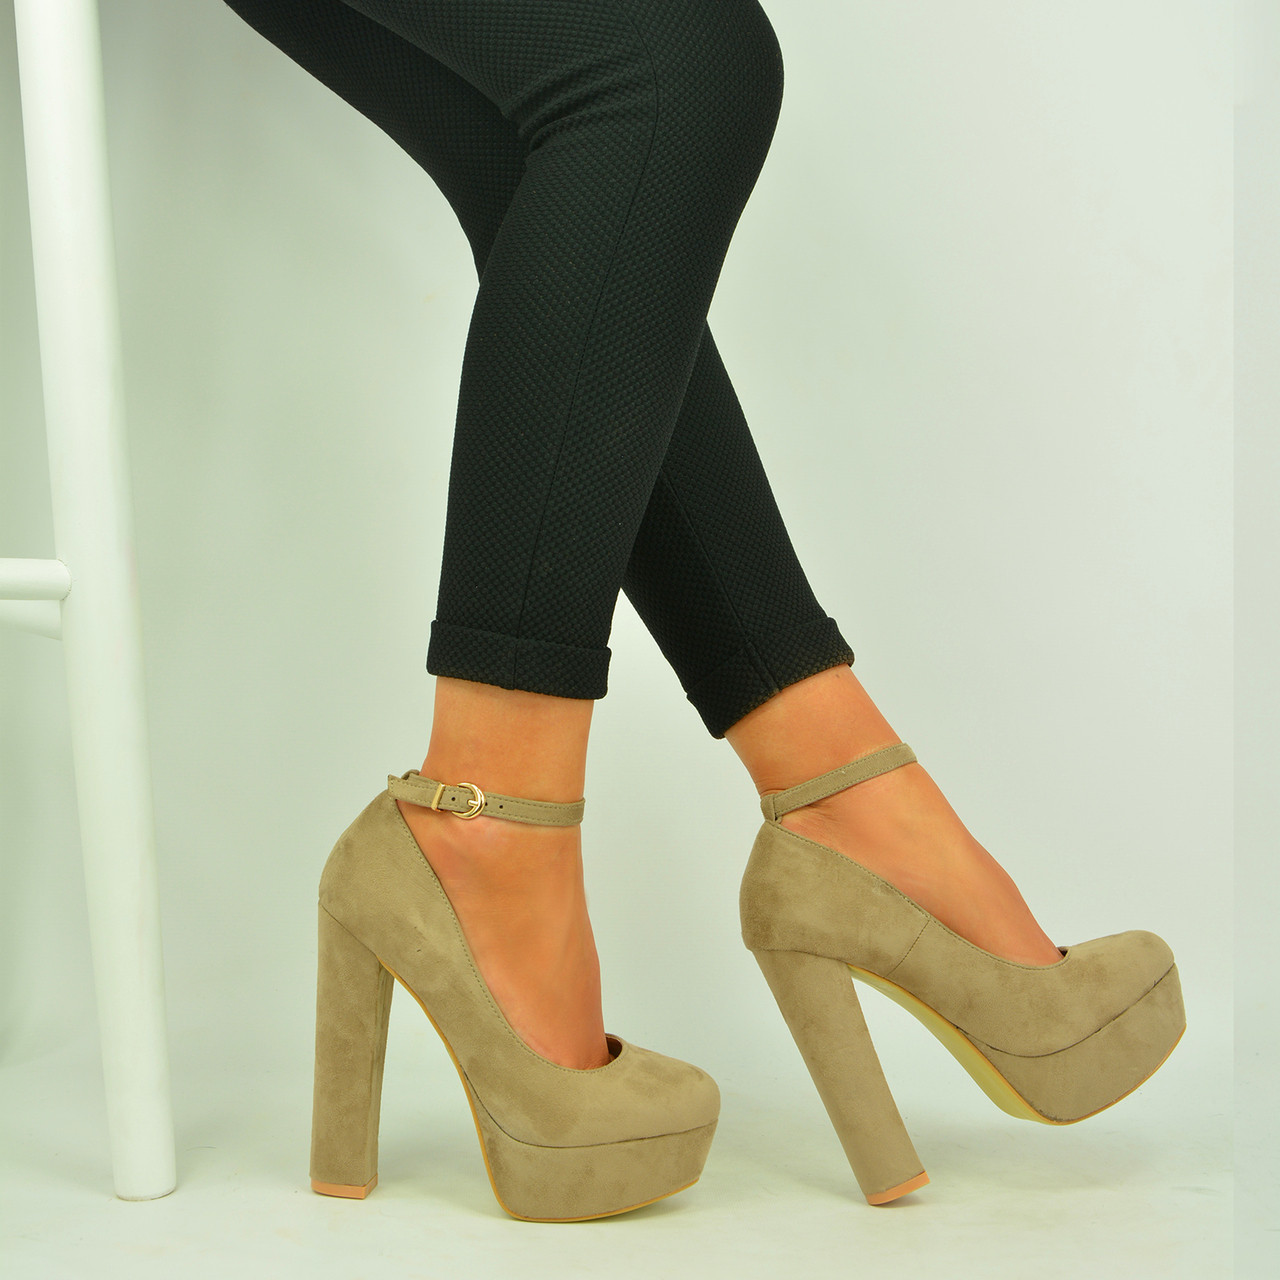 db3356addd New Womens Ladies Khaki Pumps Platform High Block Heel Sandals Shoes Size  UK 3-8